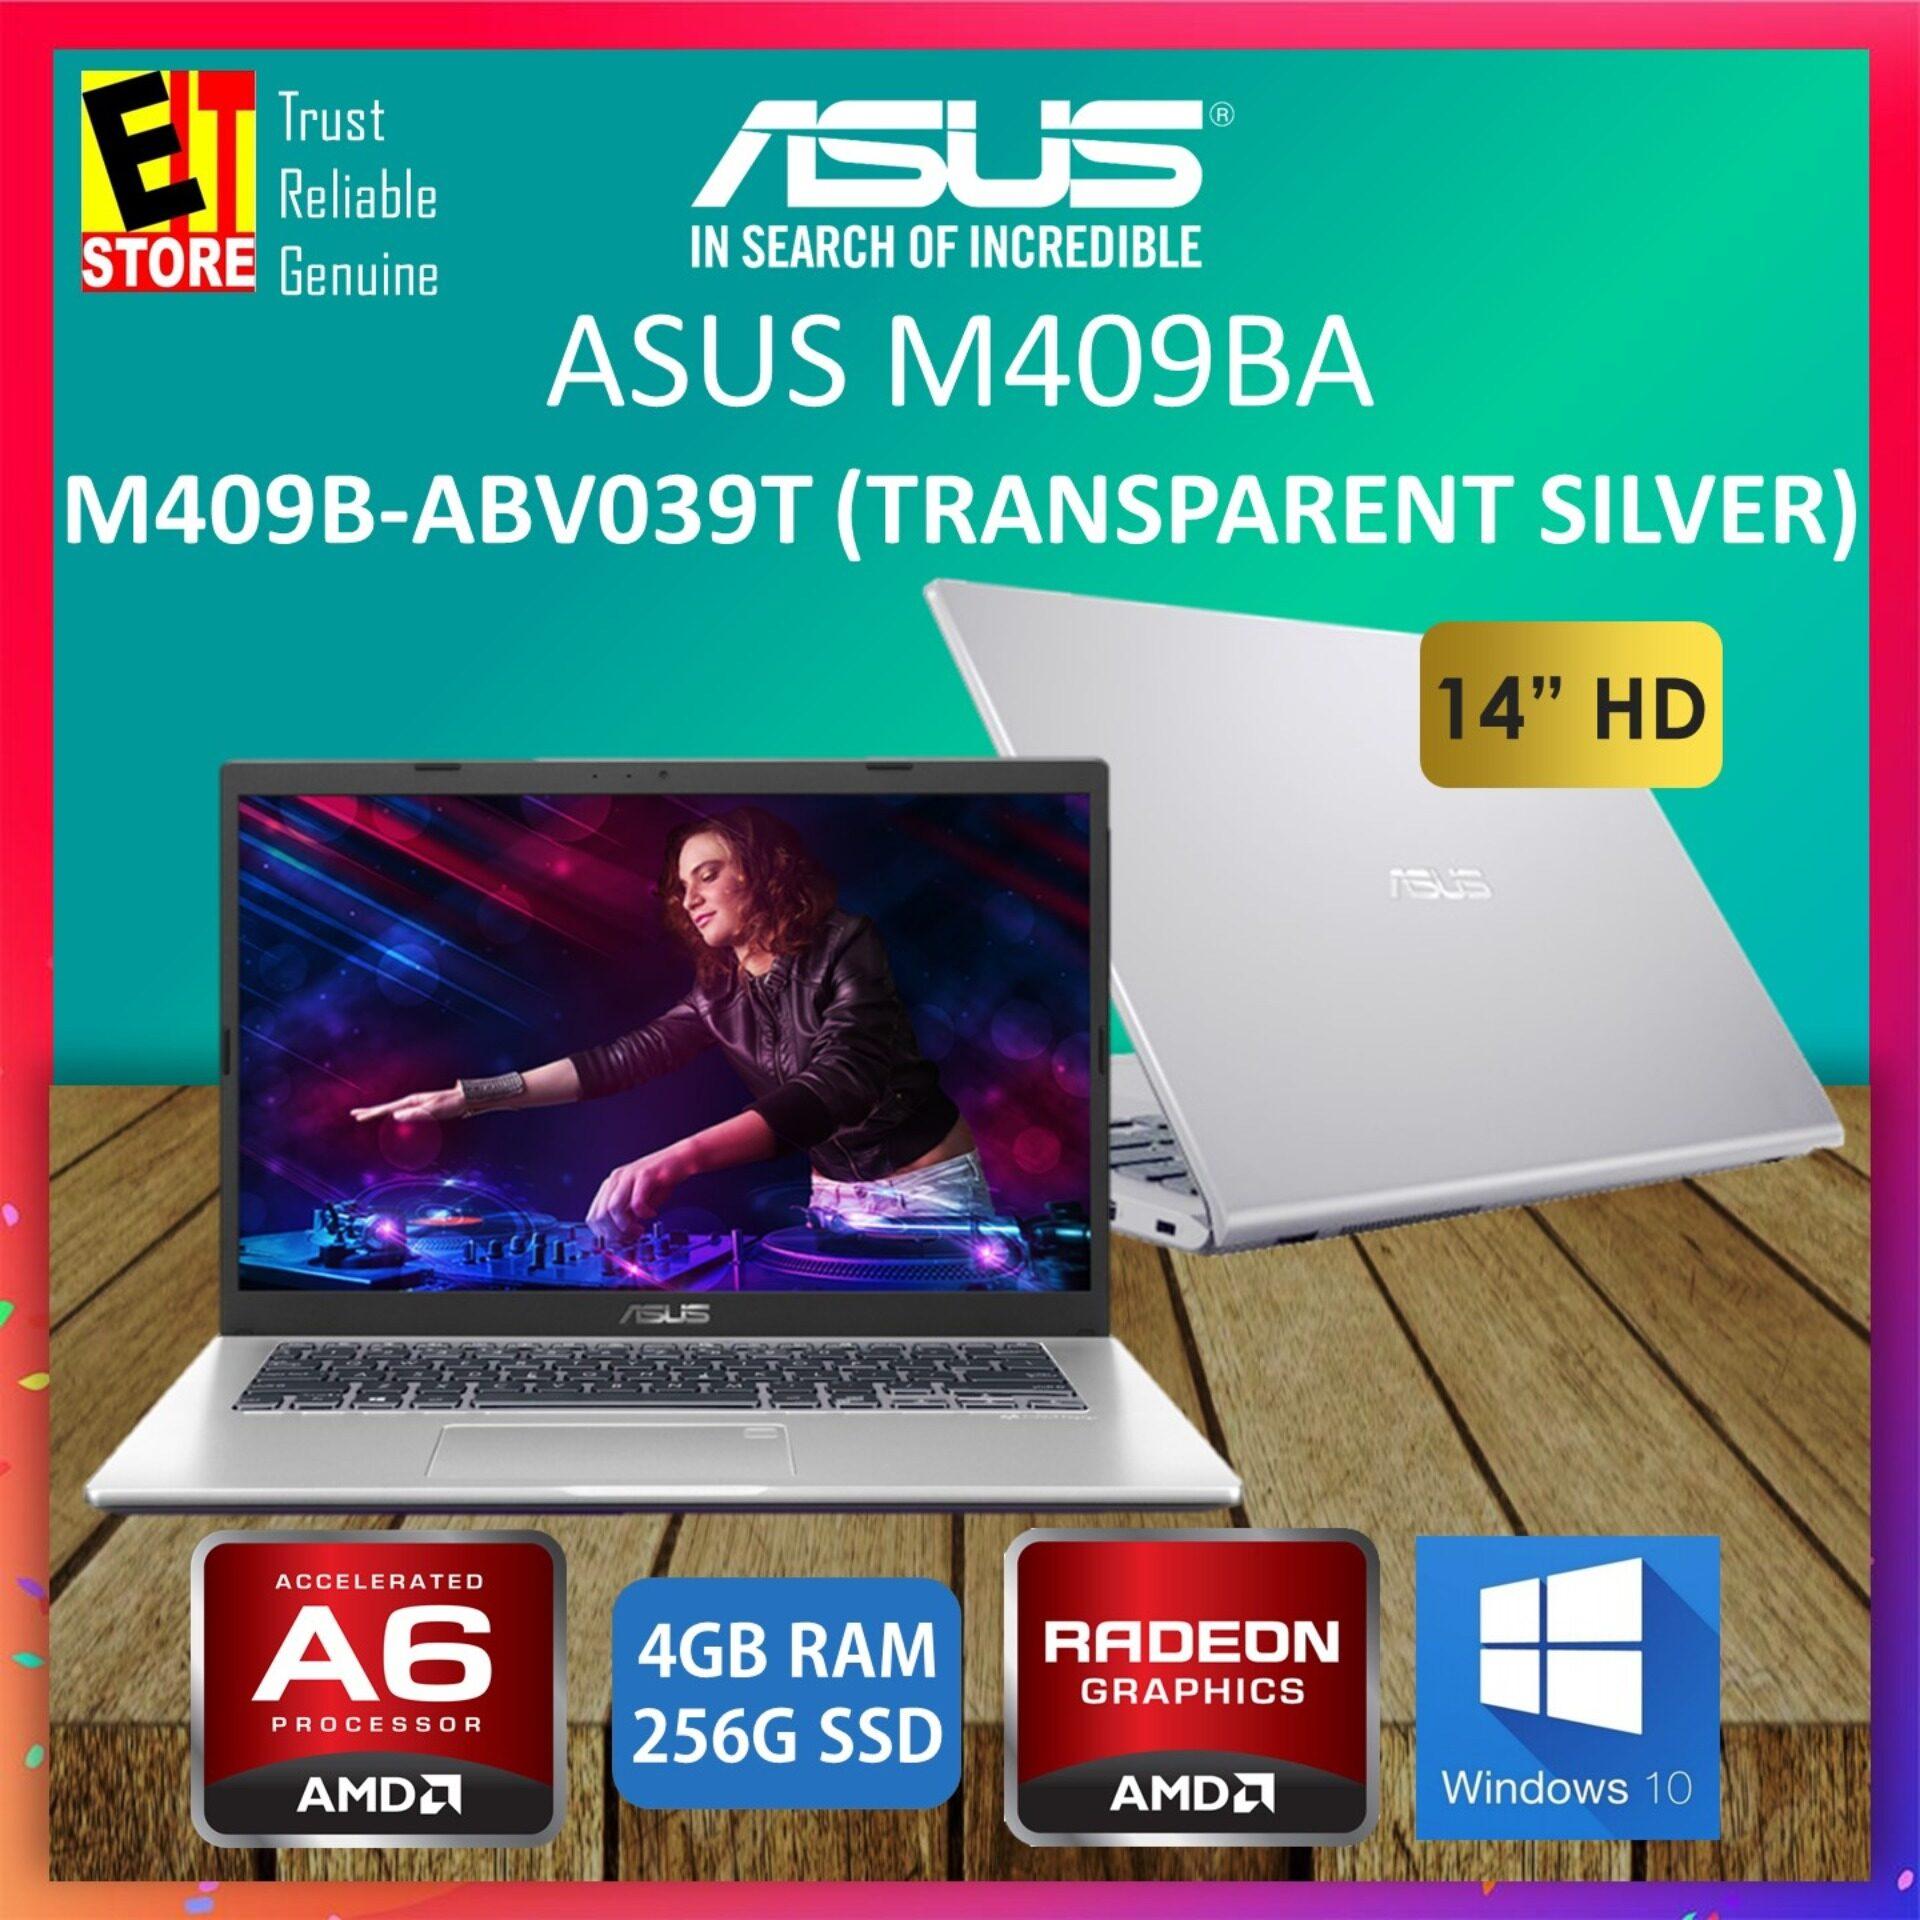 Asus Vivobook A509F-JEJ259T / A509F-JEJ258T Notebook